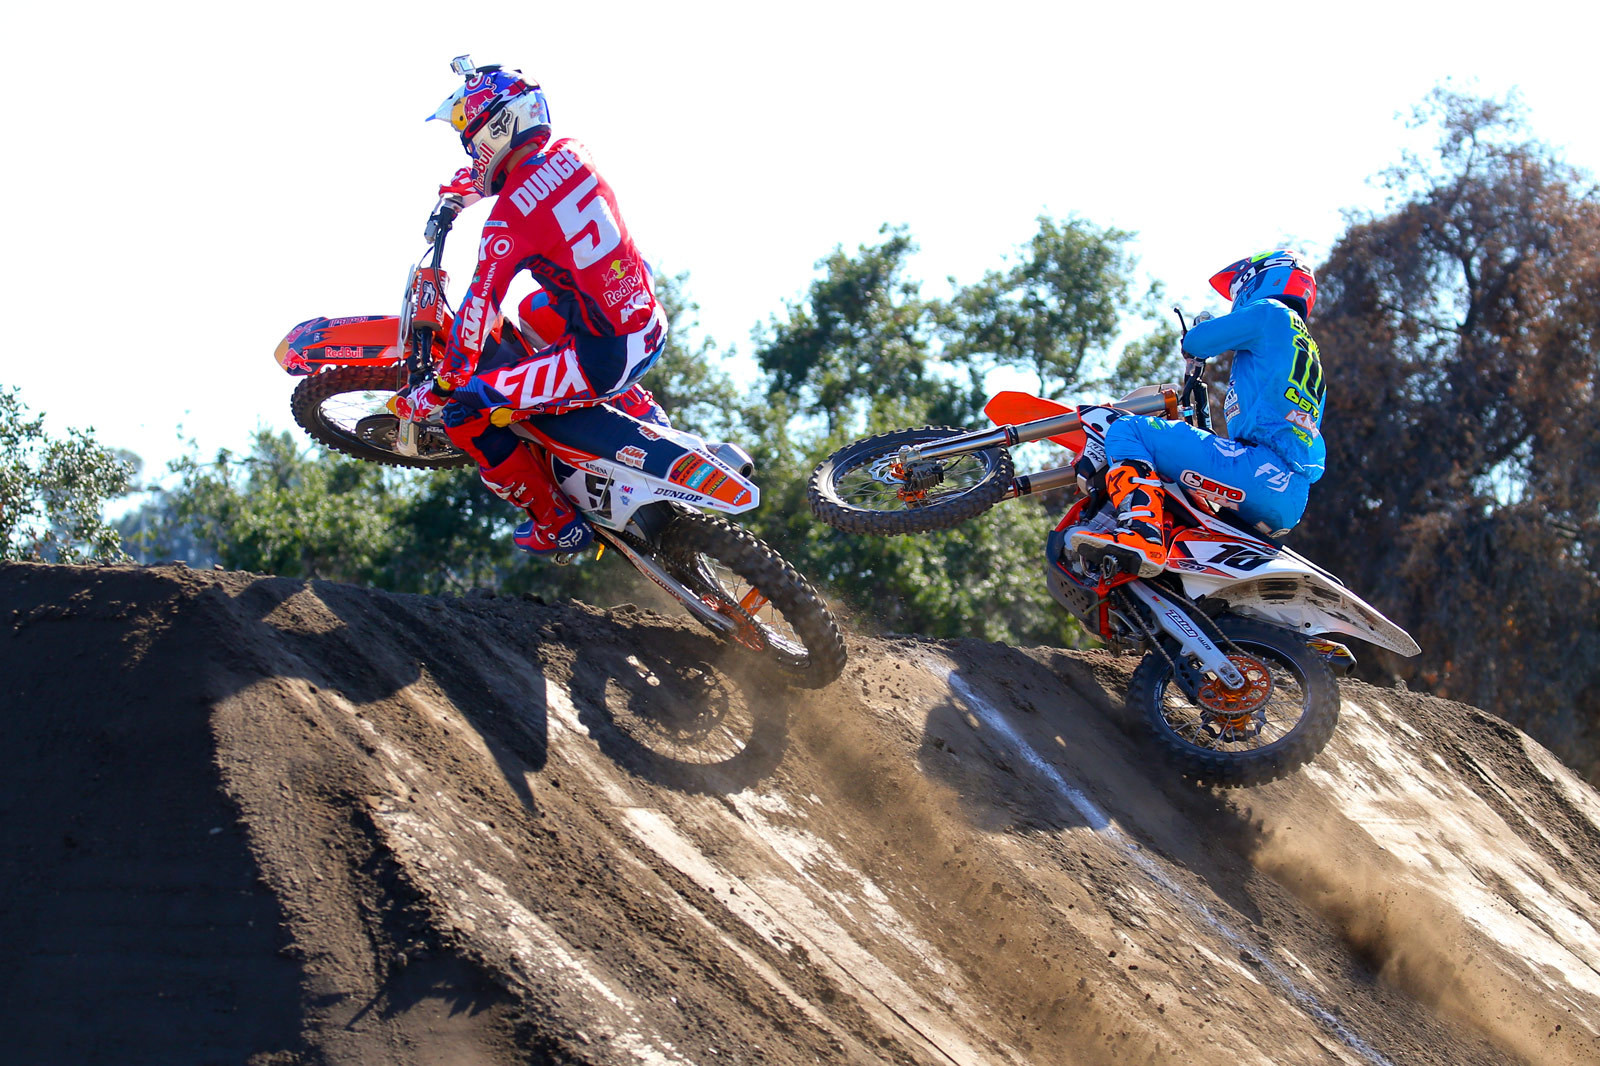 Ryan Dungey and Justin Brayton - Photo Blast: Red Bull Straight Rhythm - Motocross Pictures - Vital MX